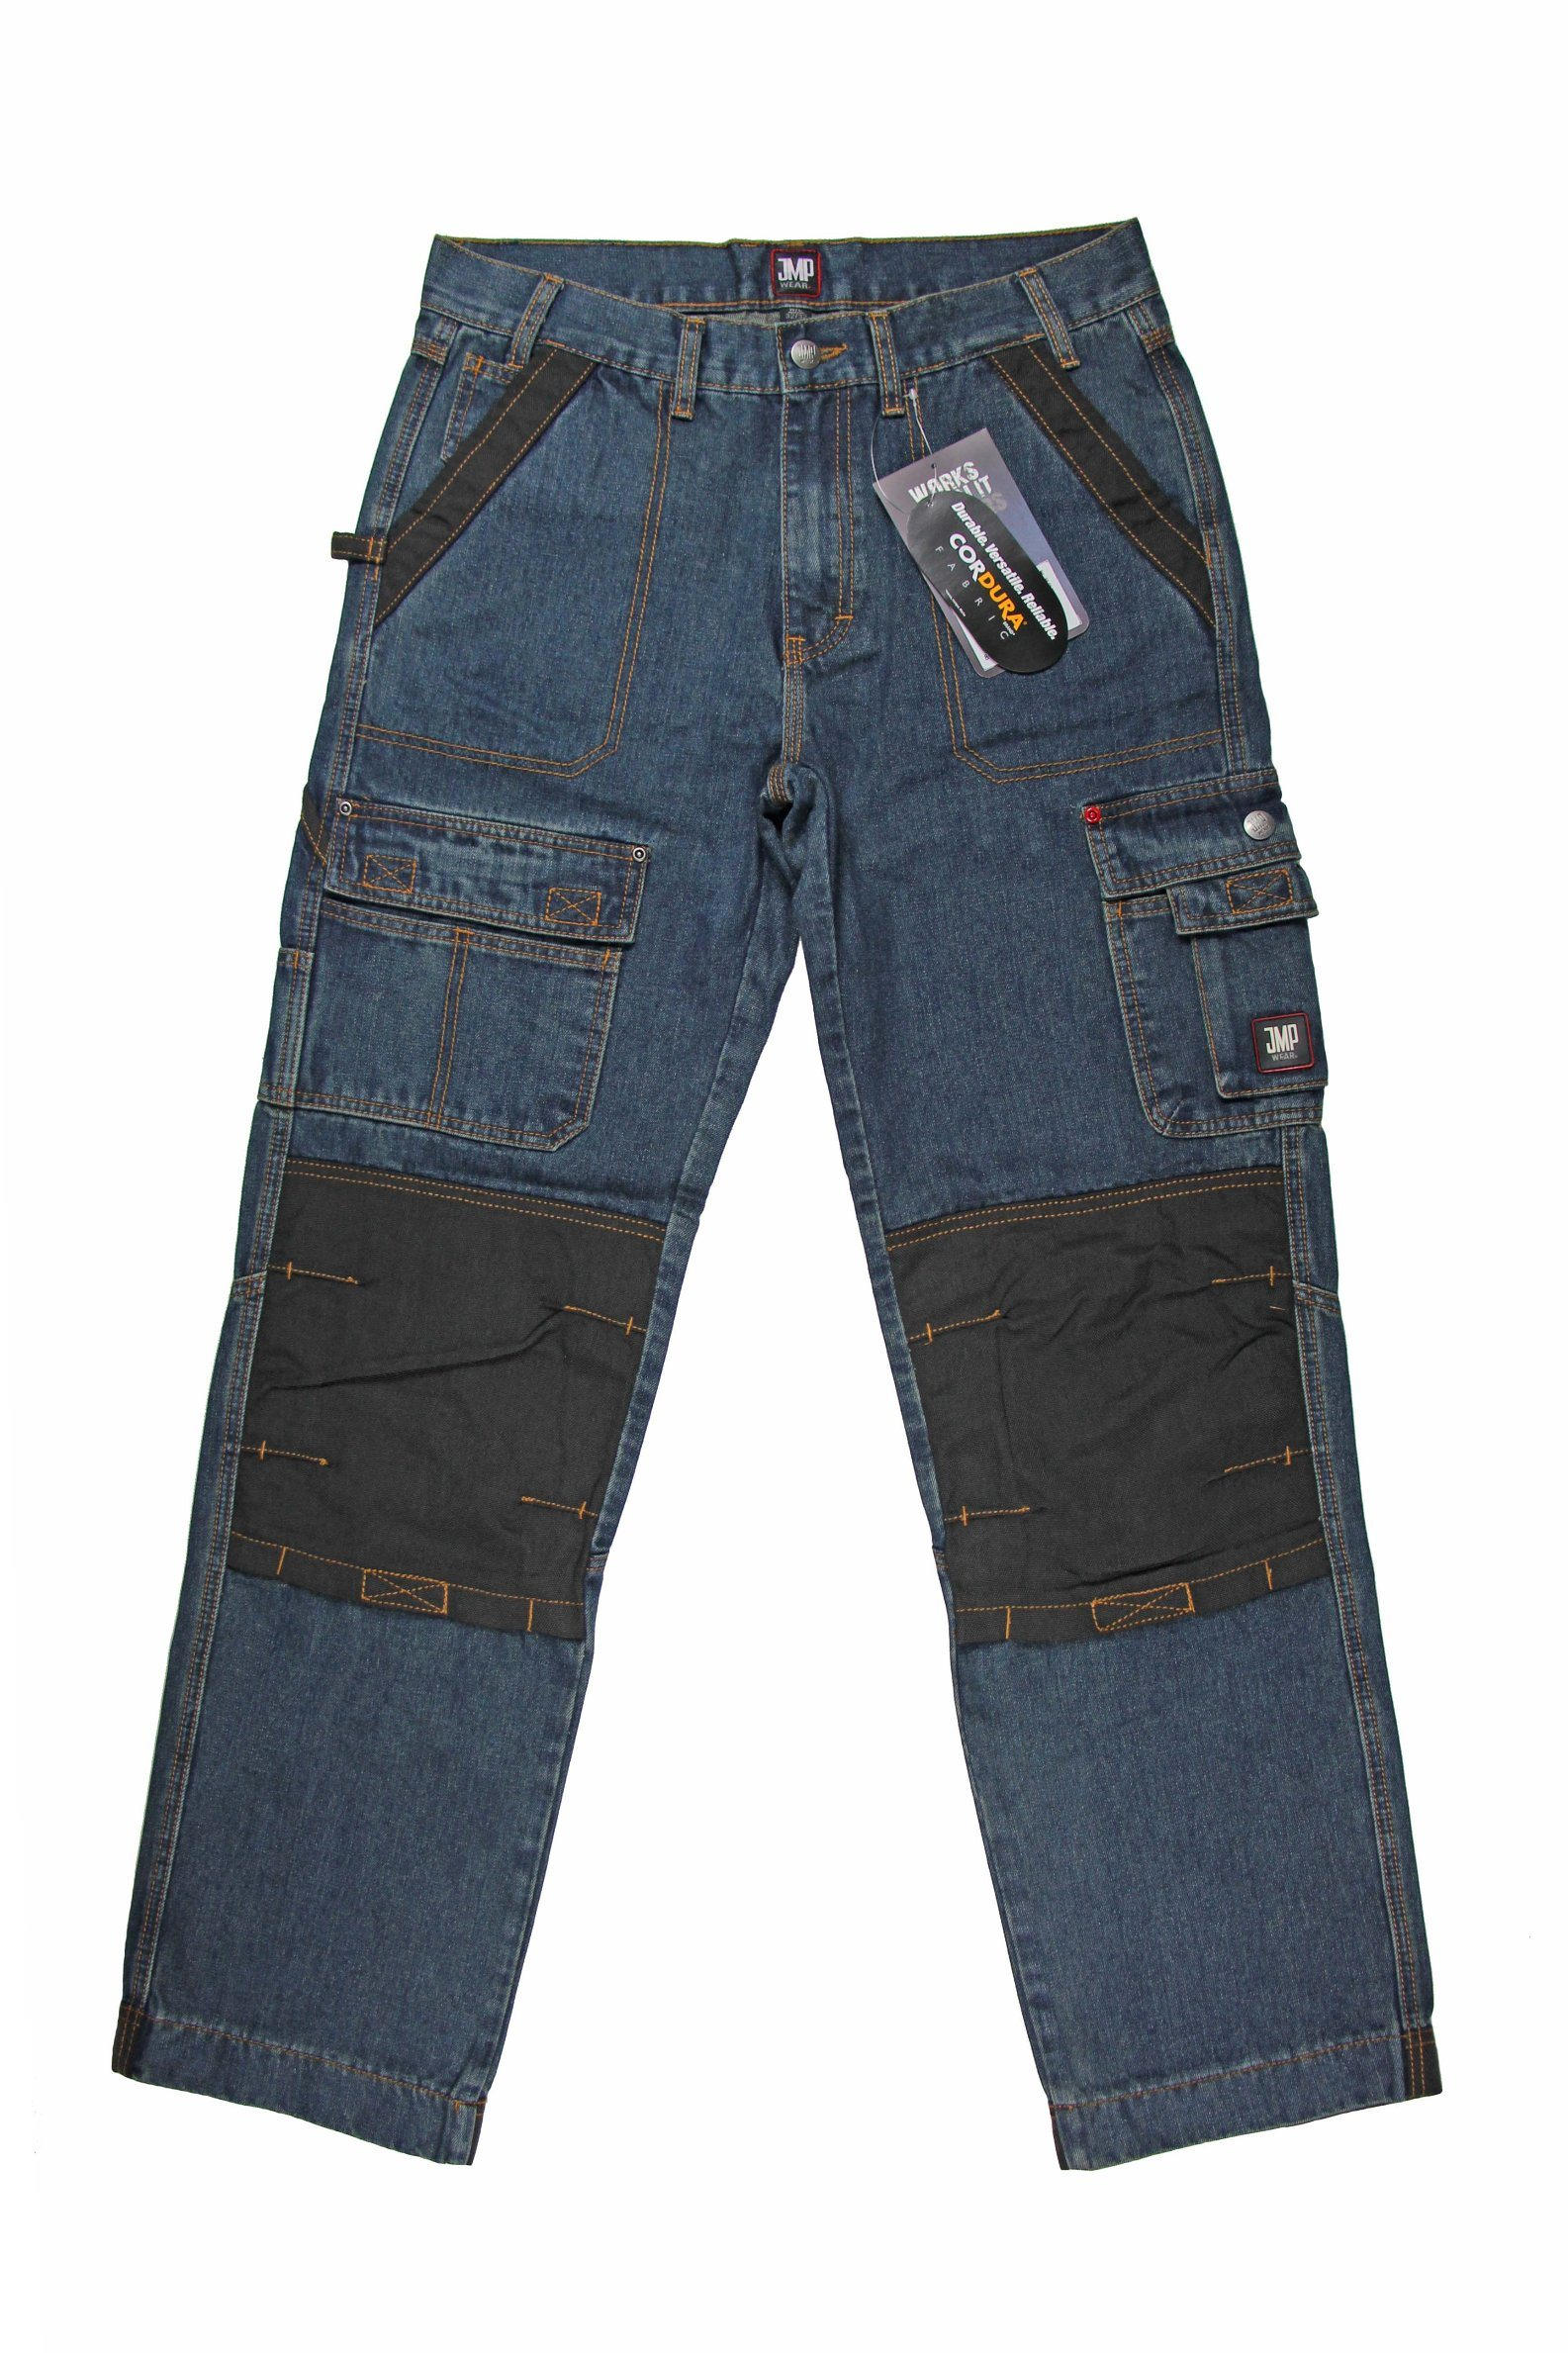 High Quality Men′s Workwear Wholesale Denim Jeans (MY-012)